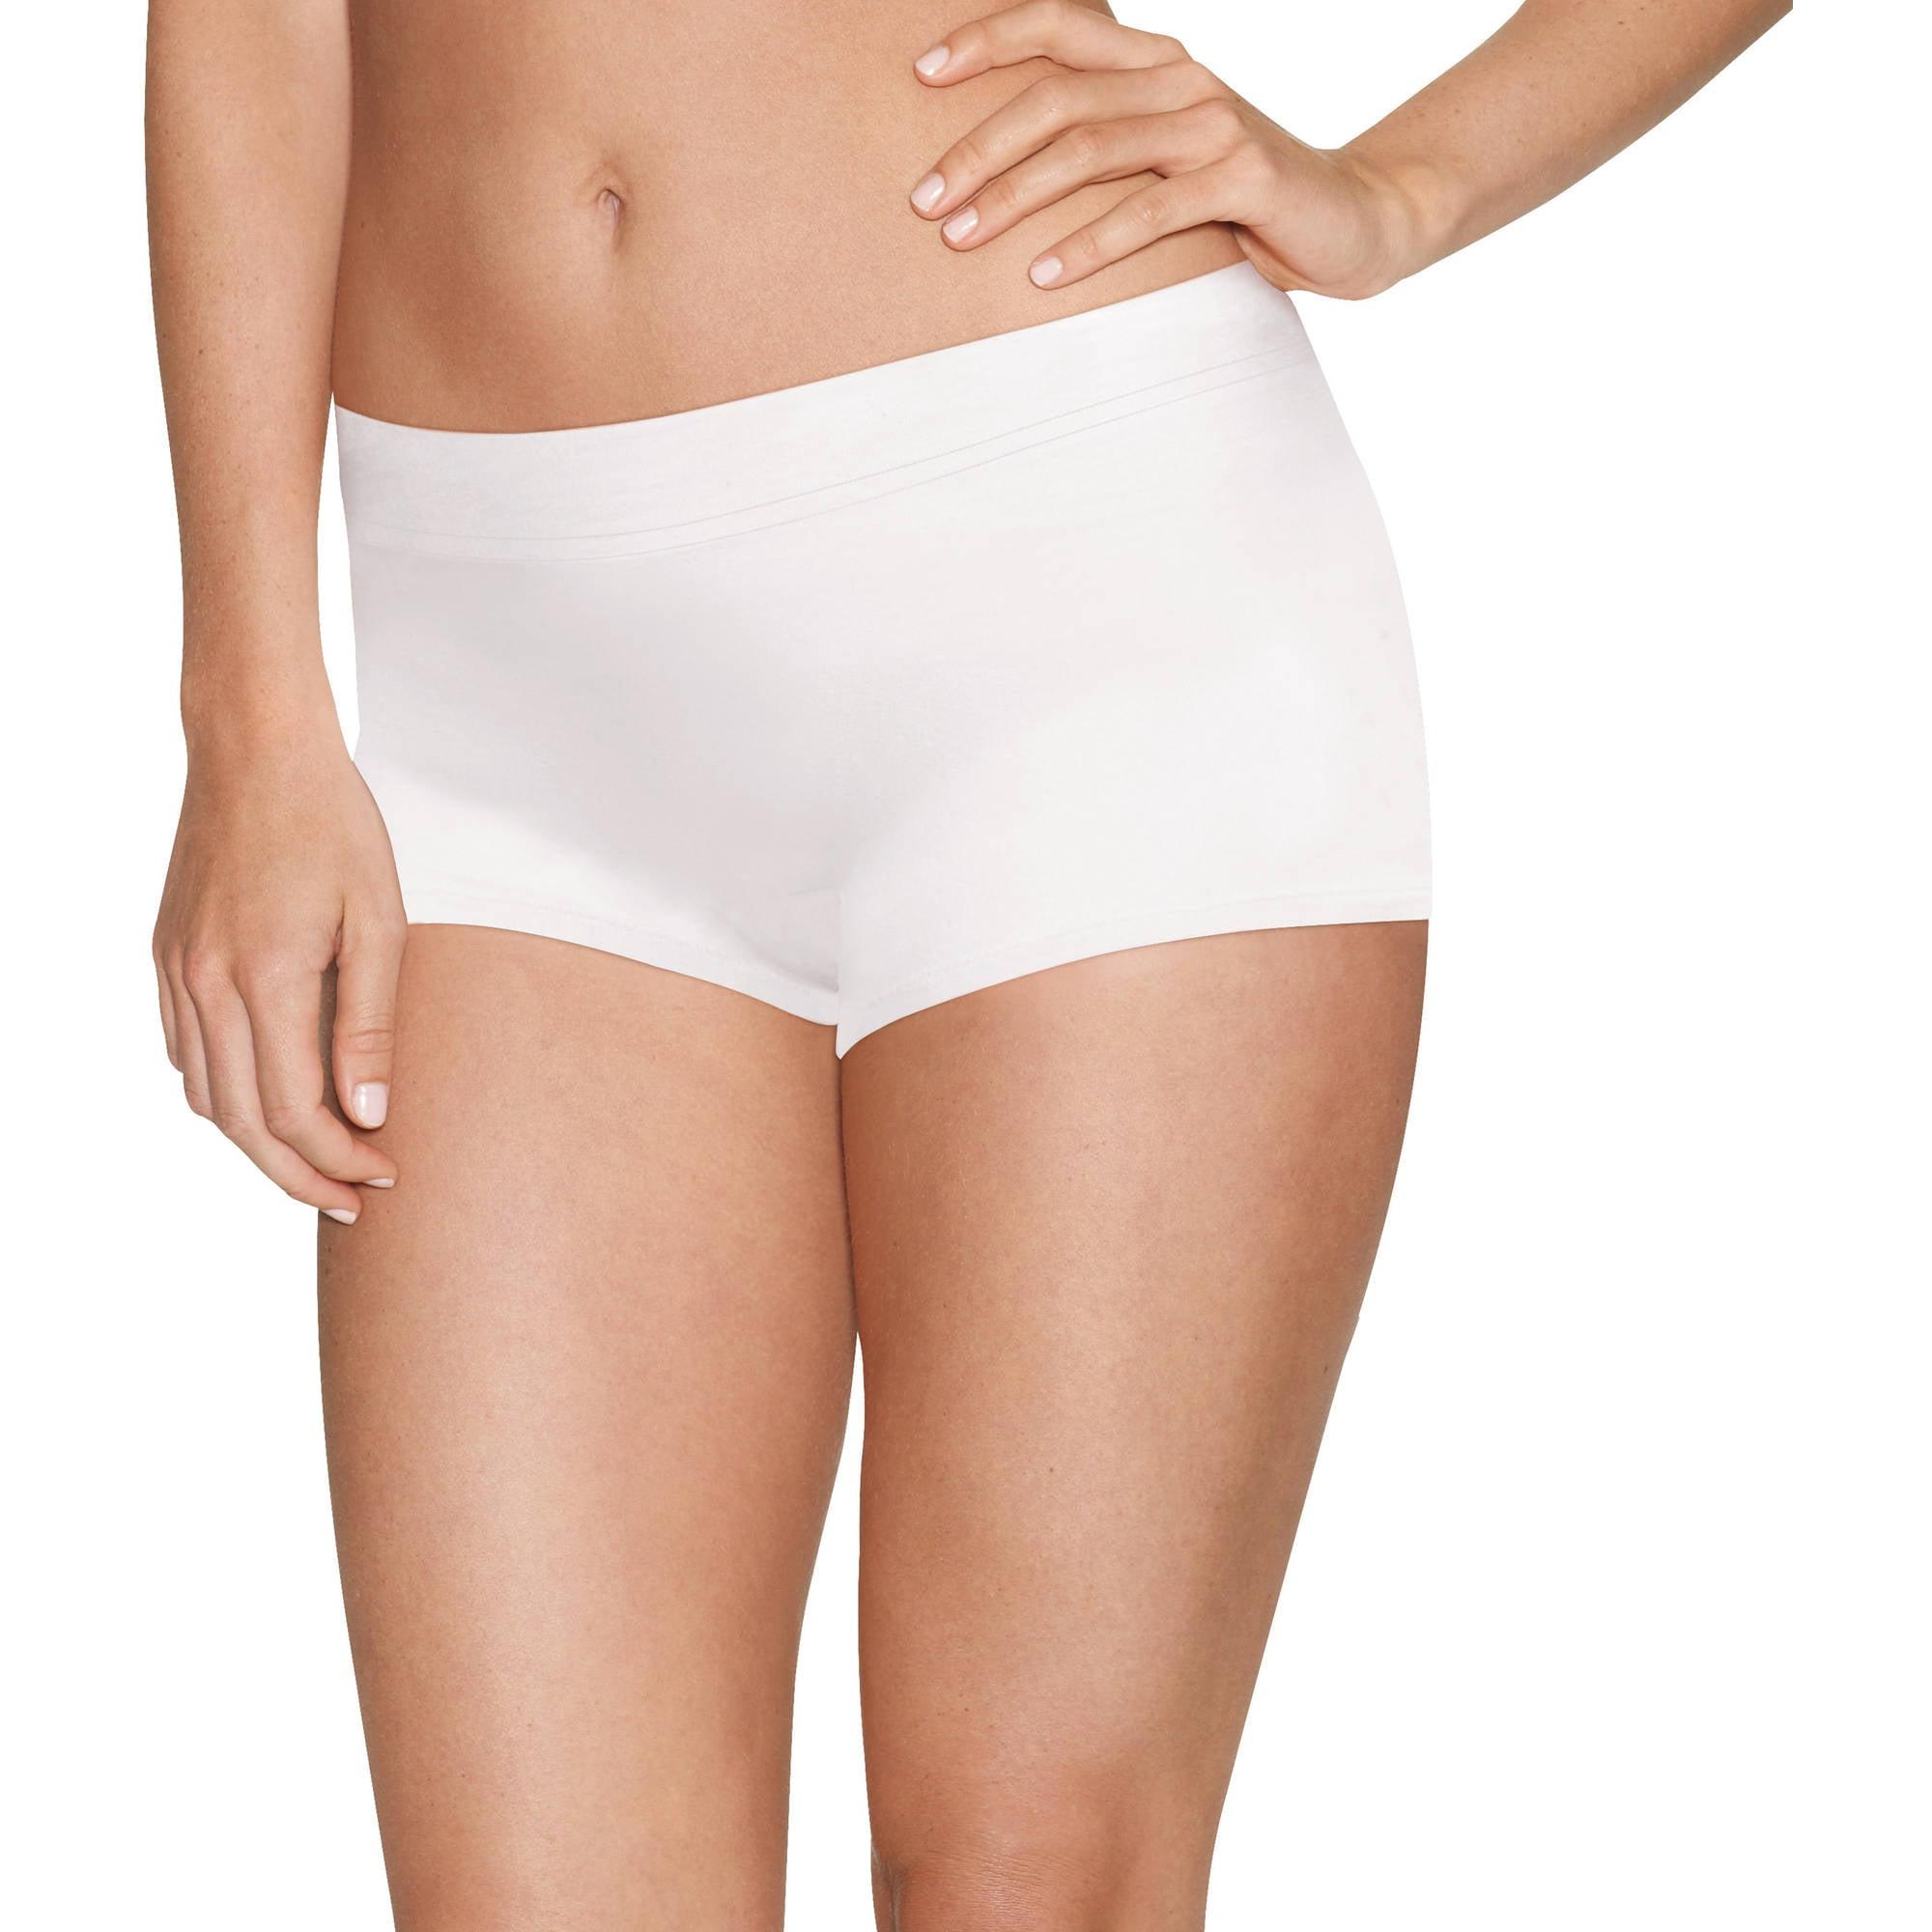 7234f24ad6ed Women's X-Temp Constant Comfort Boyshort Panties - 3 Pack - Walmart.com